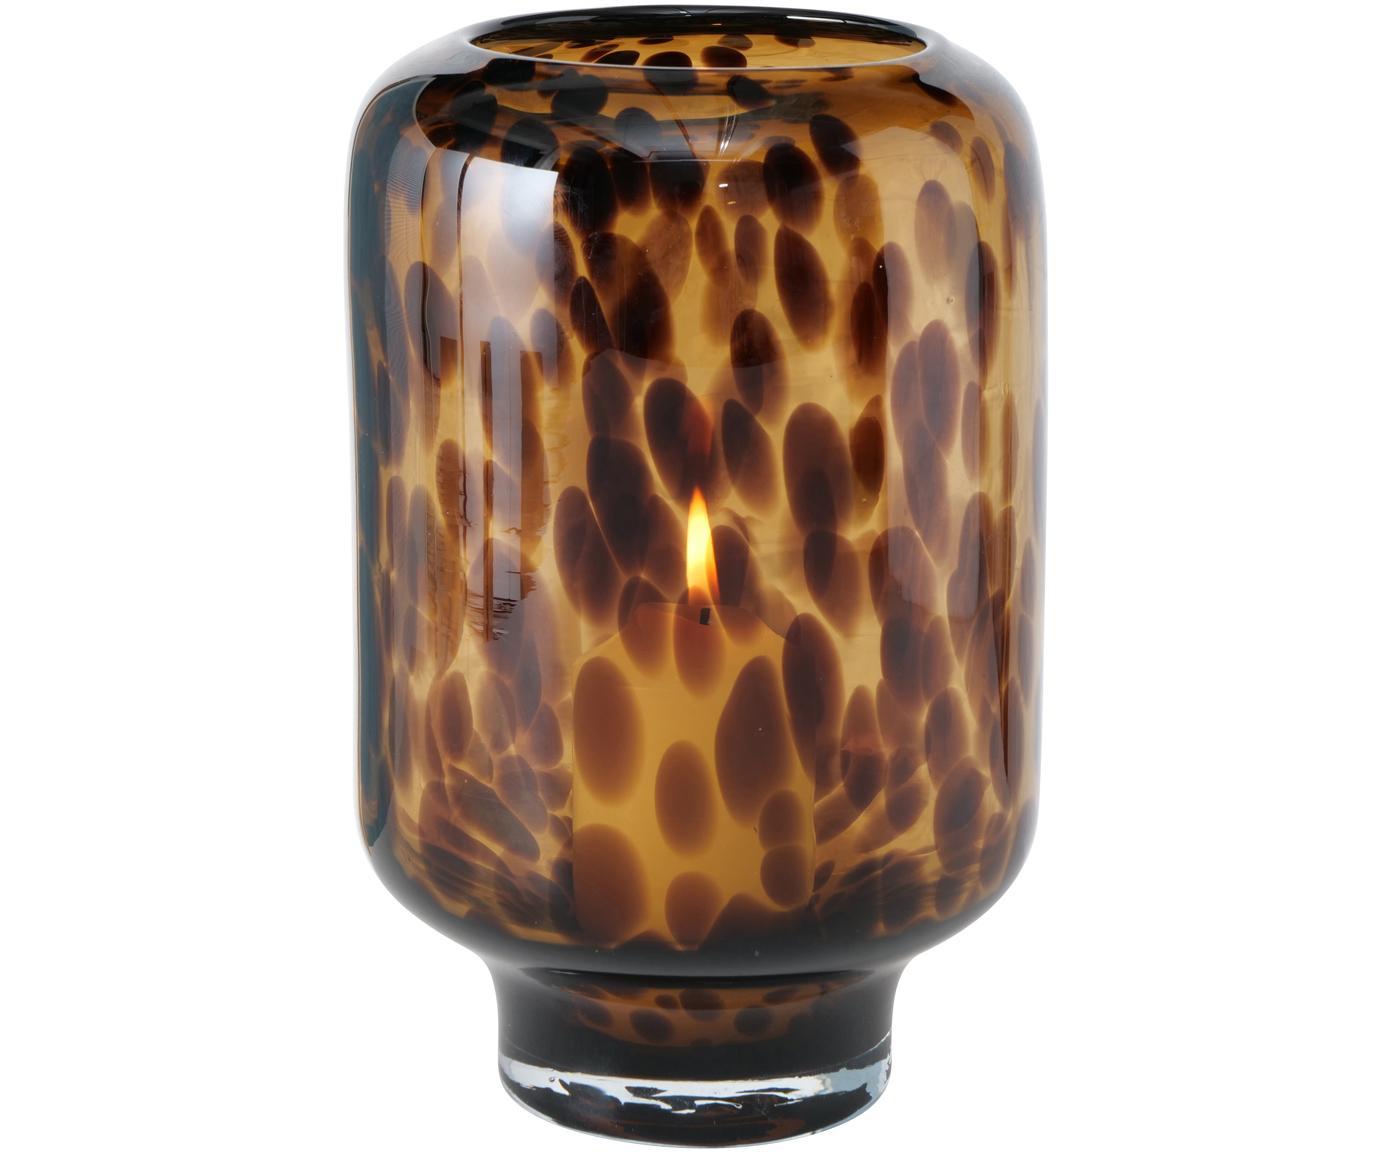 Portacandela Leopard, Vetro, Tonalità marrone, Ø 14 x Alt. 22 cm